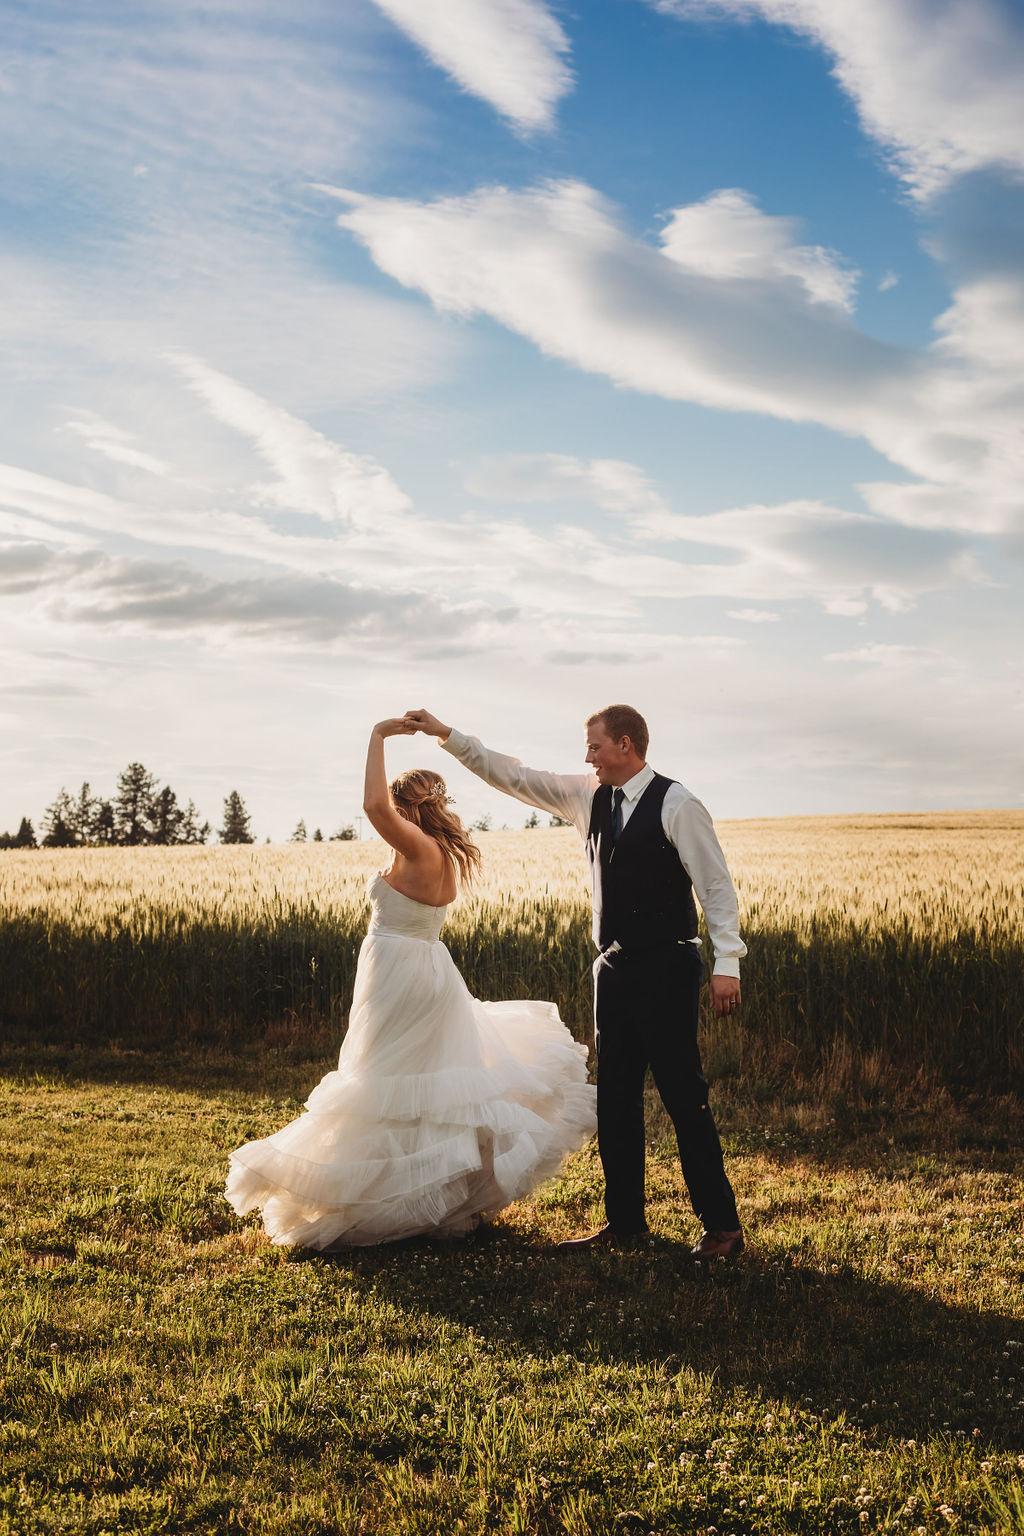 spinning sunset pictures spokane field wedding